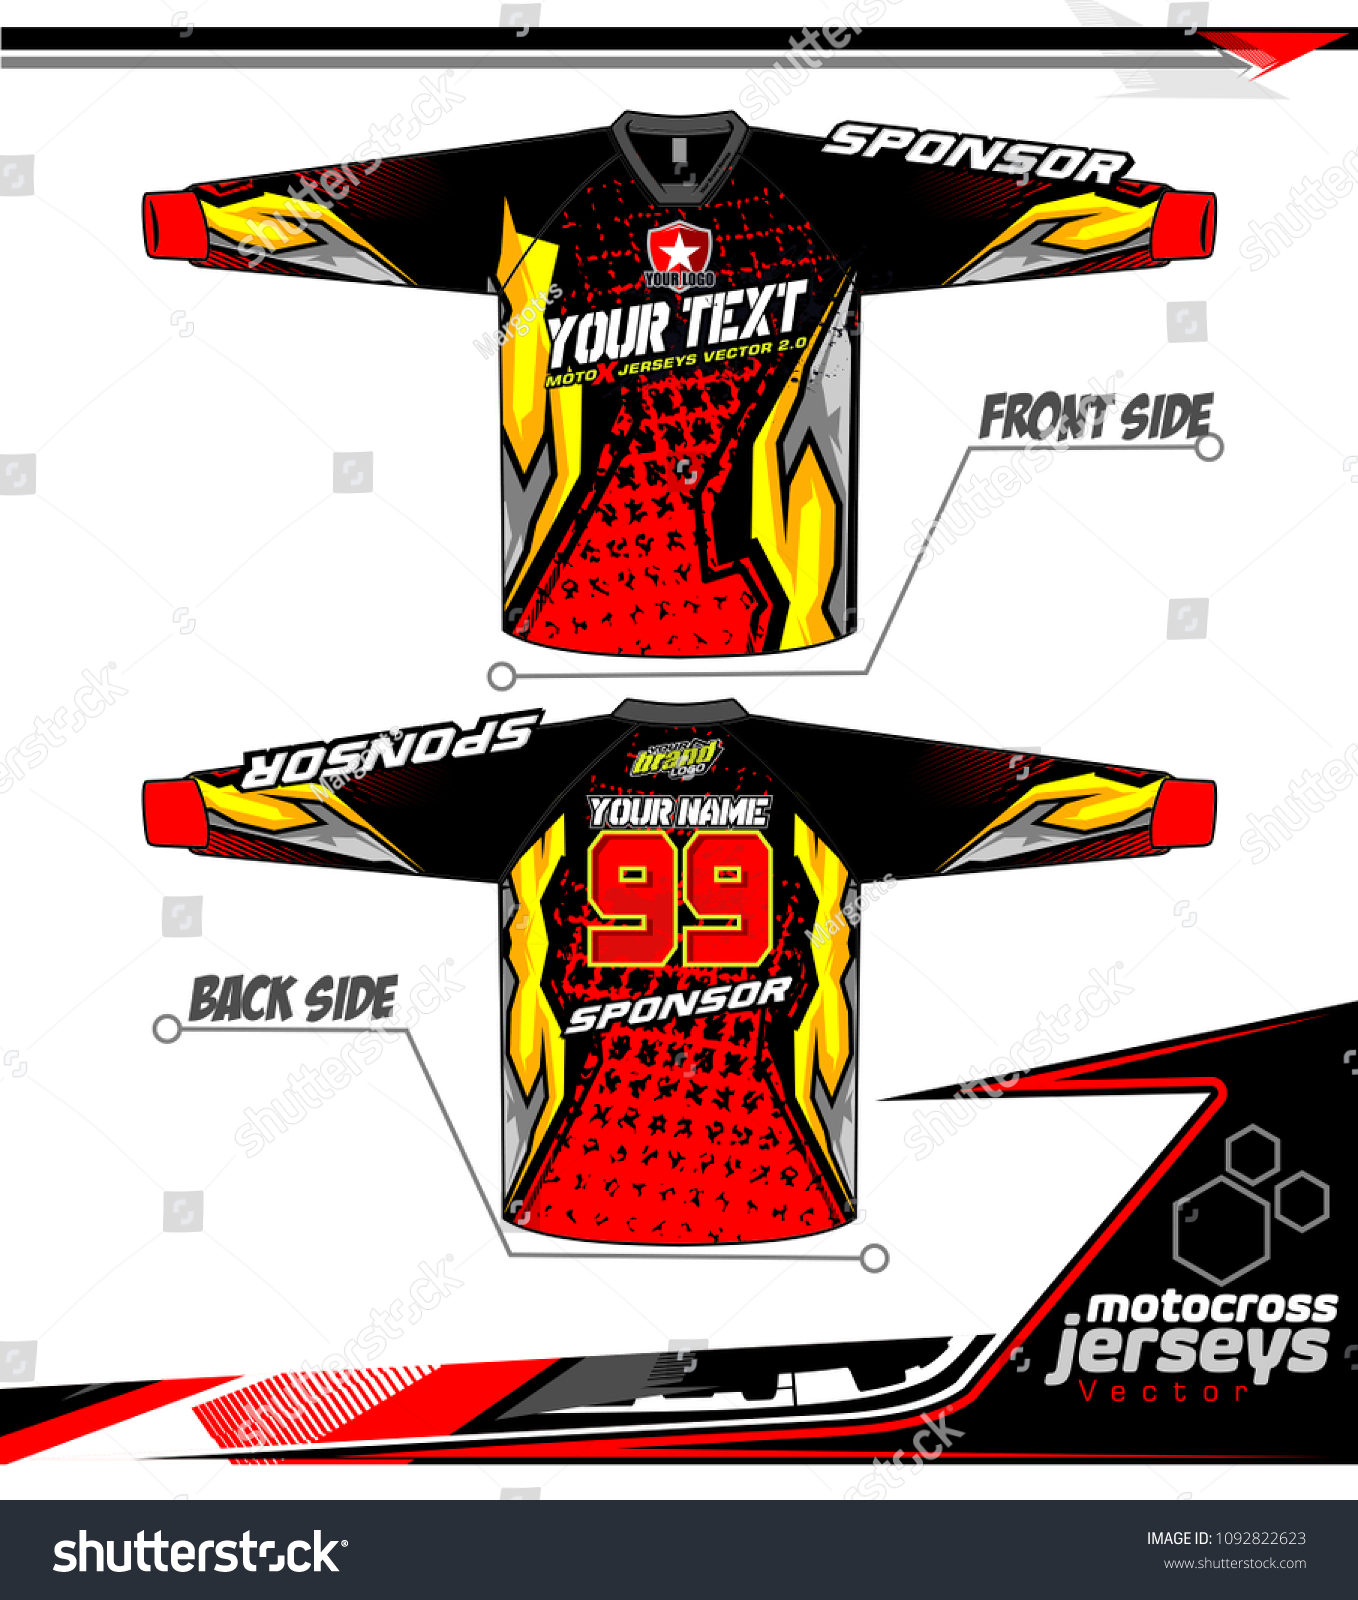 2dacf7b4 Long sleeve Motocross jerseys t-shirts vector, graphic design for football  uniforms, unisex